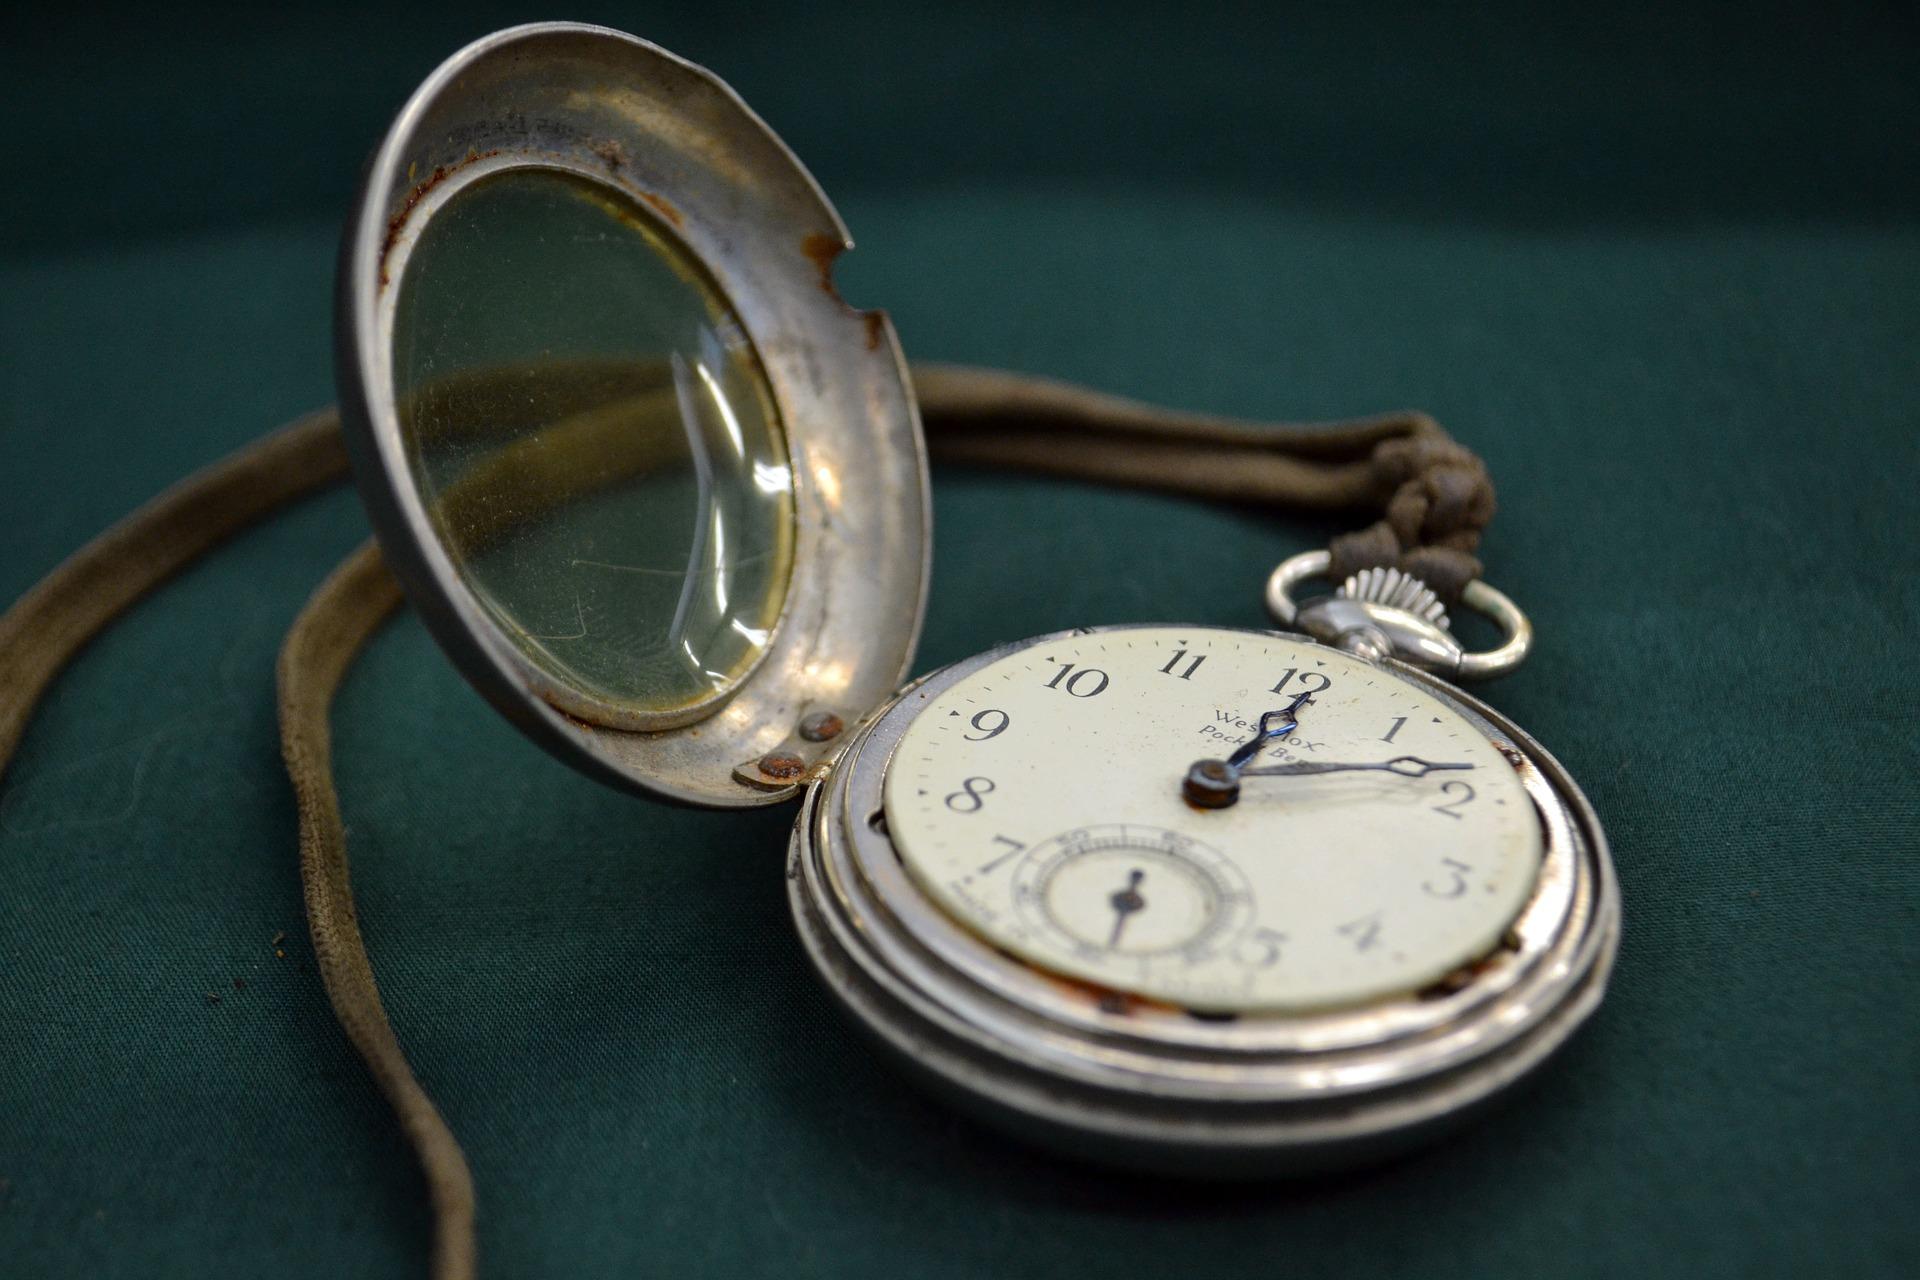 watch-1267420_1920